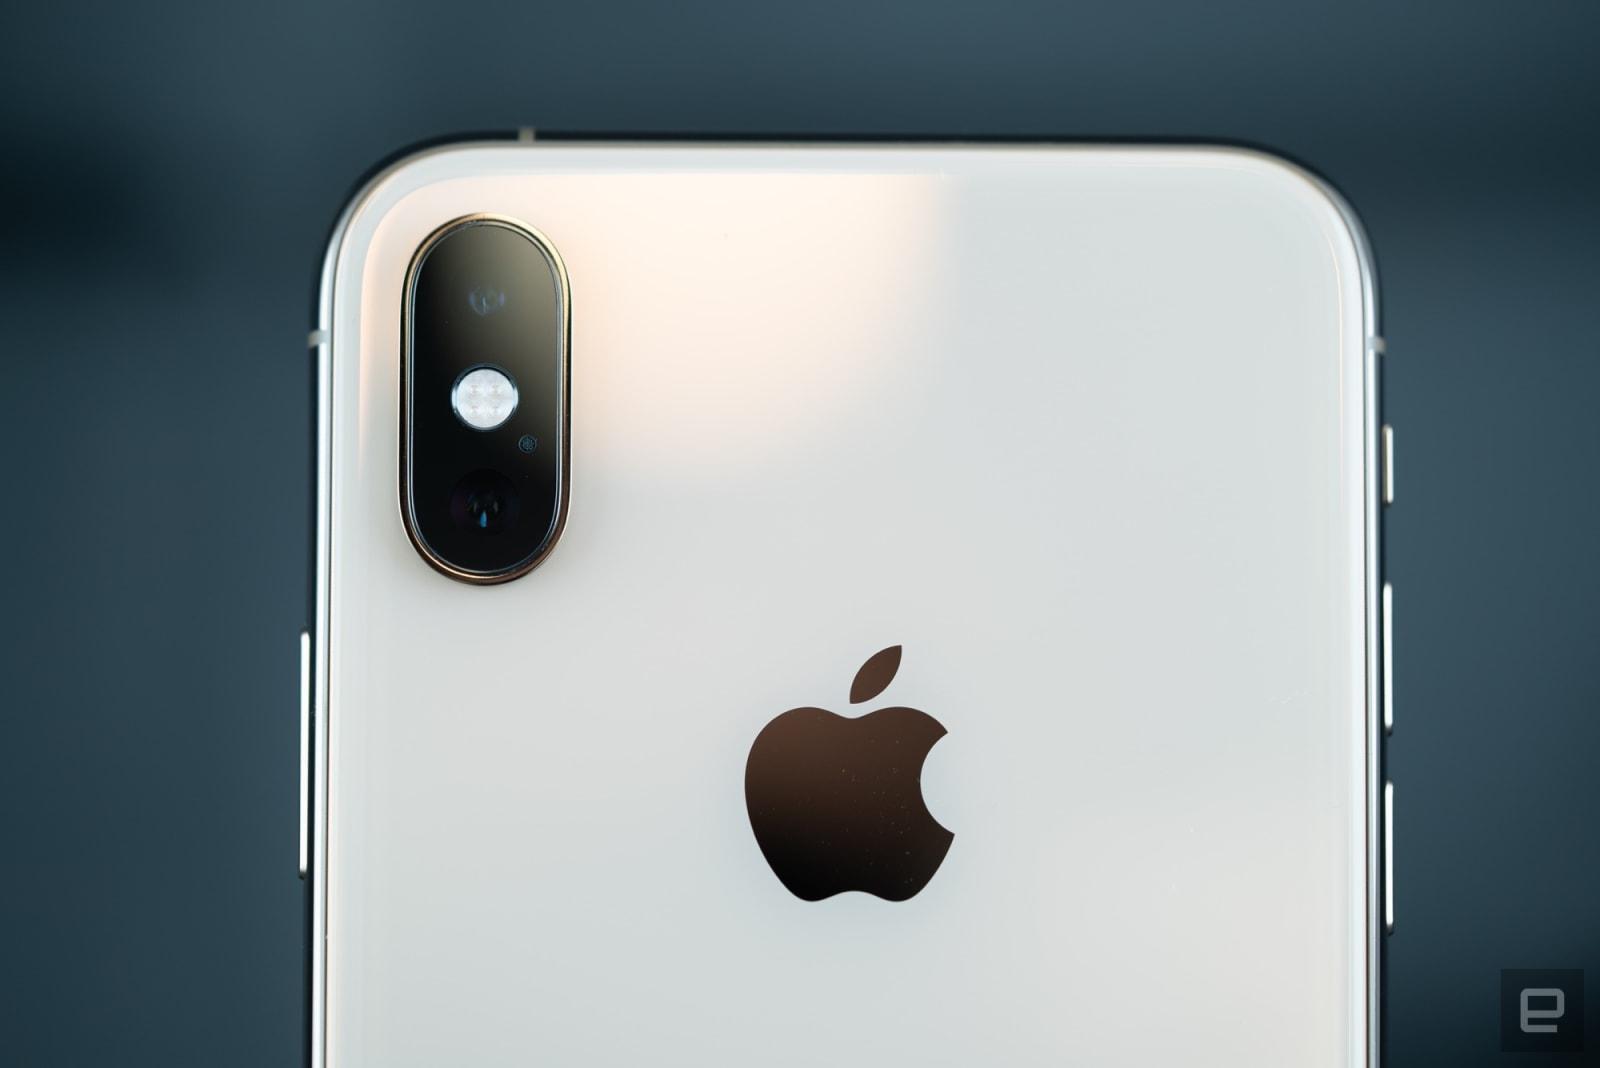 Ming-Chi Kuo apple rumors 16-inch MacBook Pro 31-inch 6K display